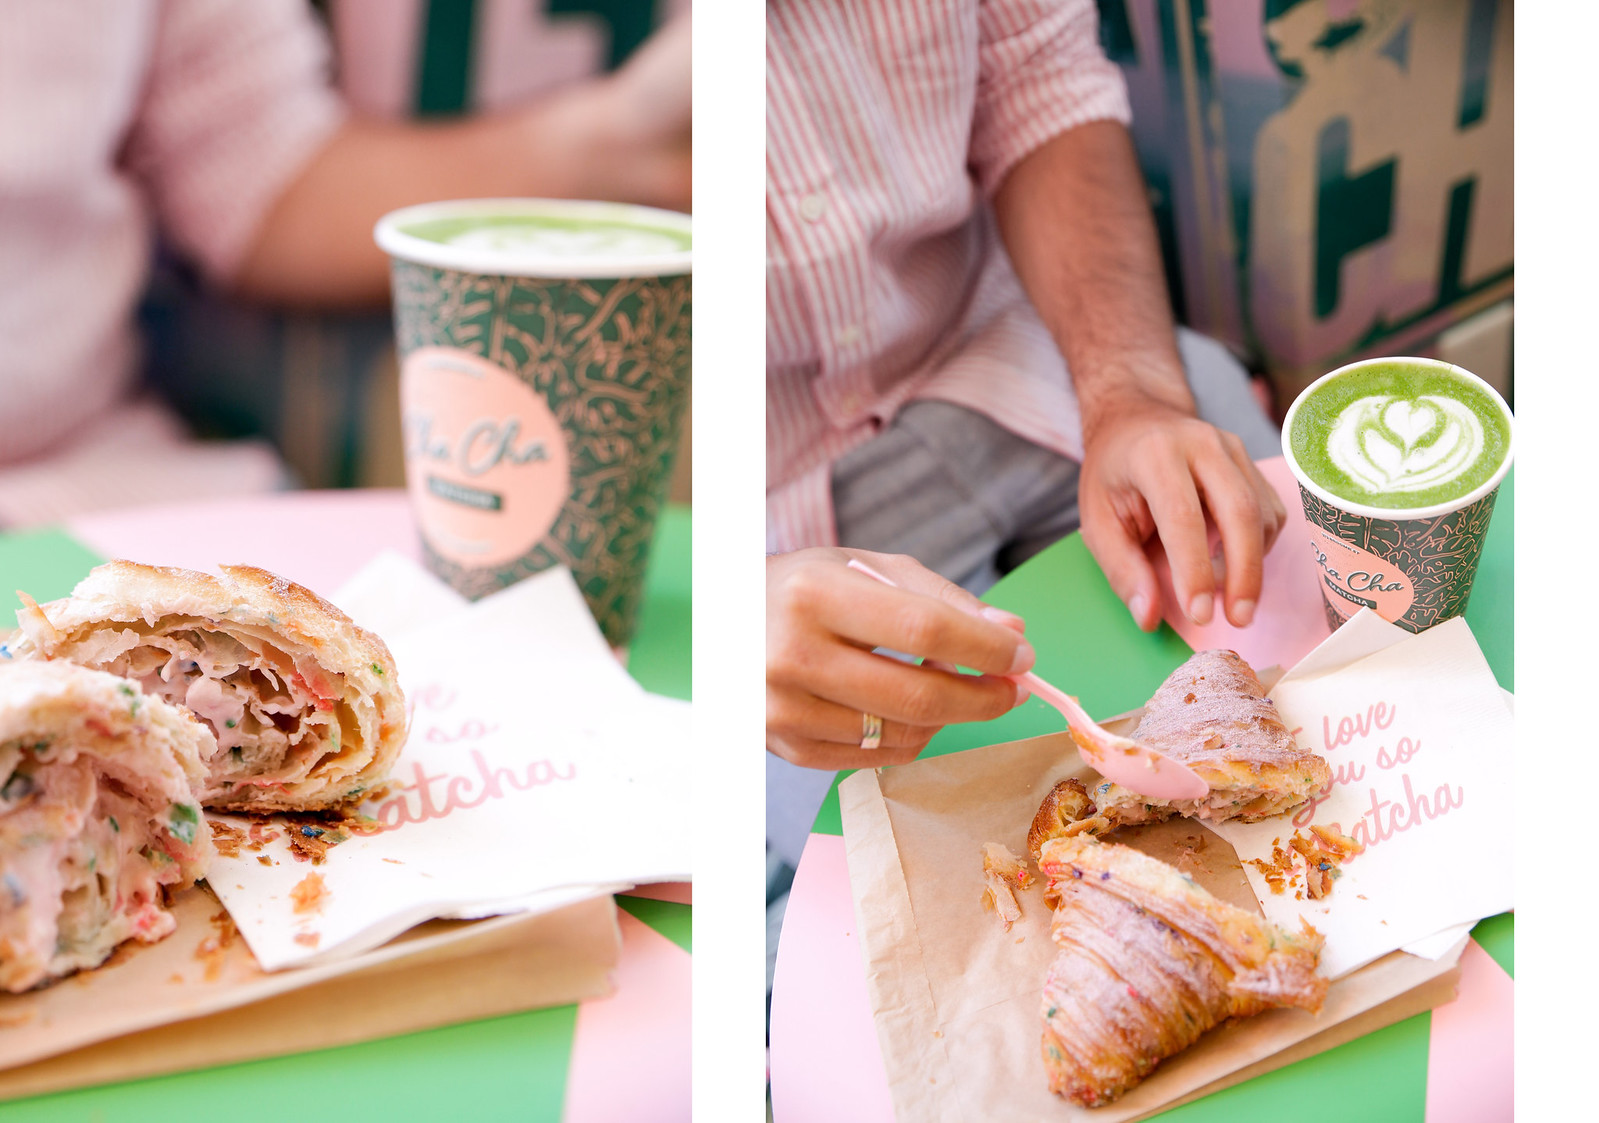 08_cha_cha_matcha_cafeteria_rosa_nueva_york_el_mejor_matcha_unicorn_croissant_breakfast_theguestgirl_nyc